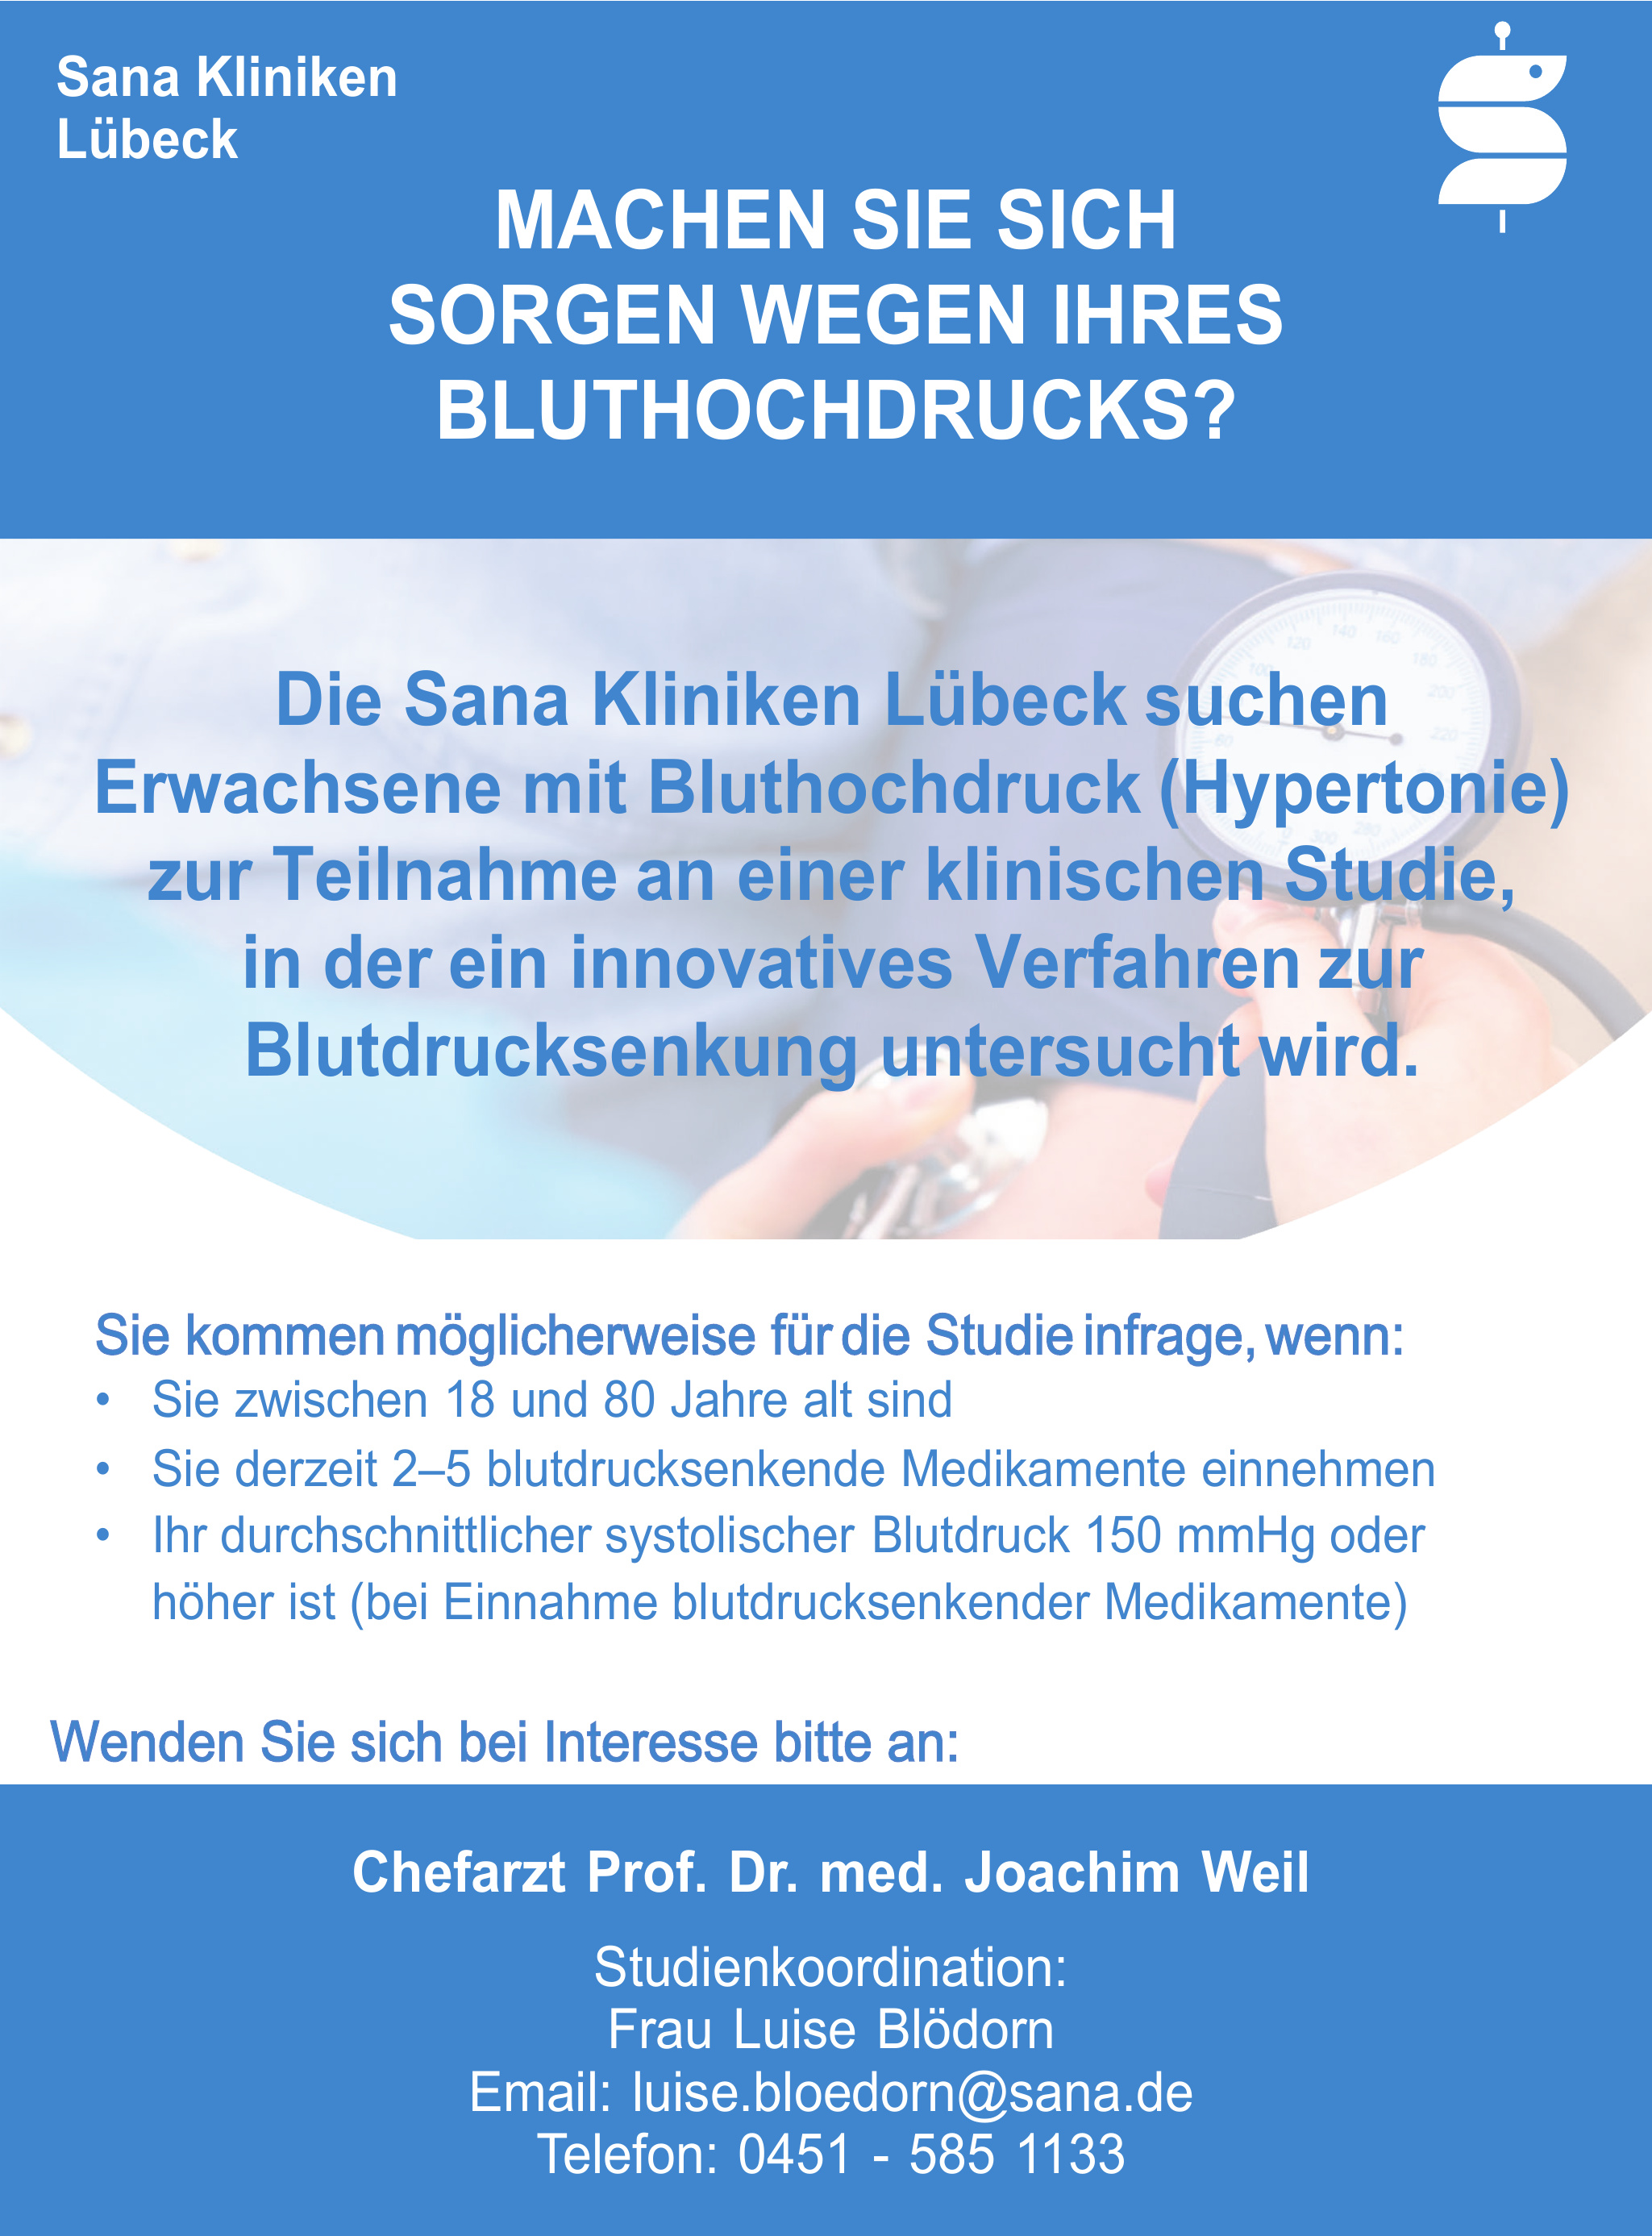 Sana Kliniken Lübeck